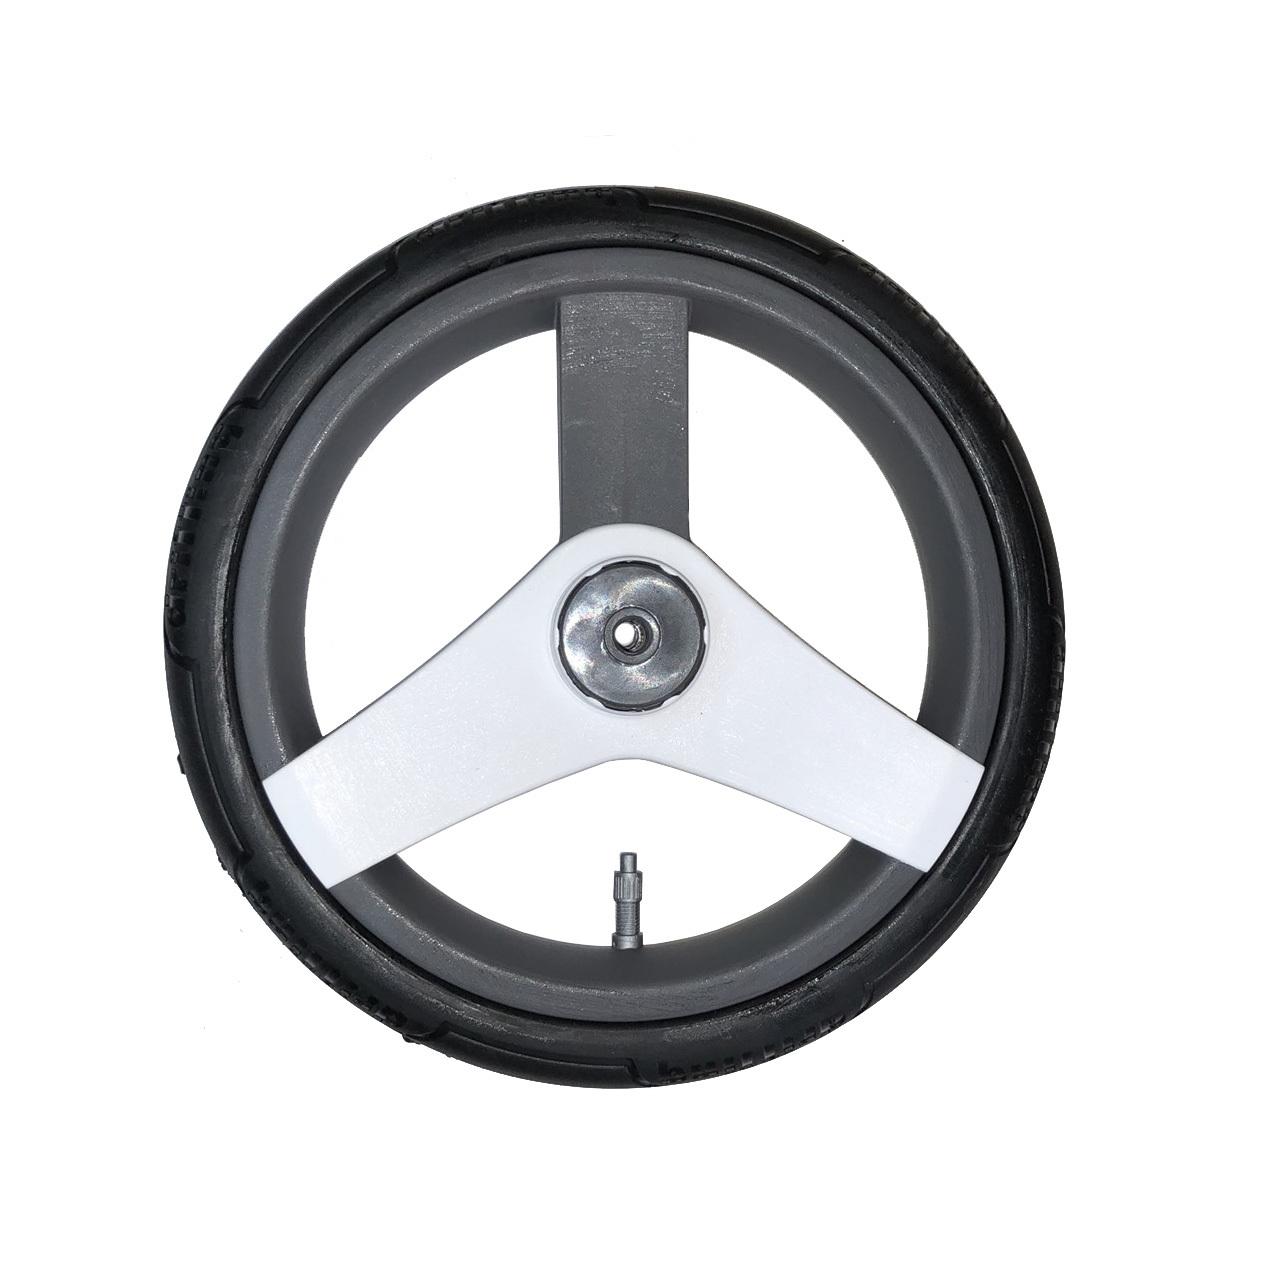 Колеса для детских колясок Колесо Adamex Vicco переднее (бескамерное) vicco_10.jpg